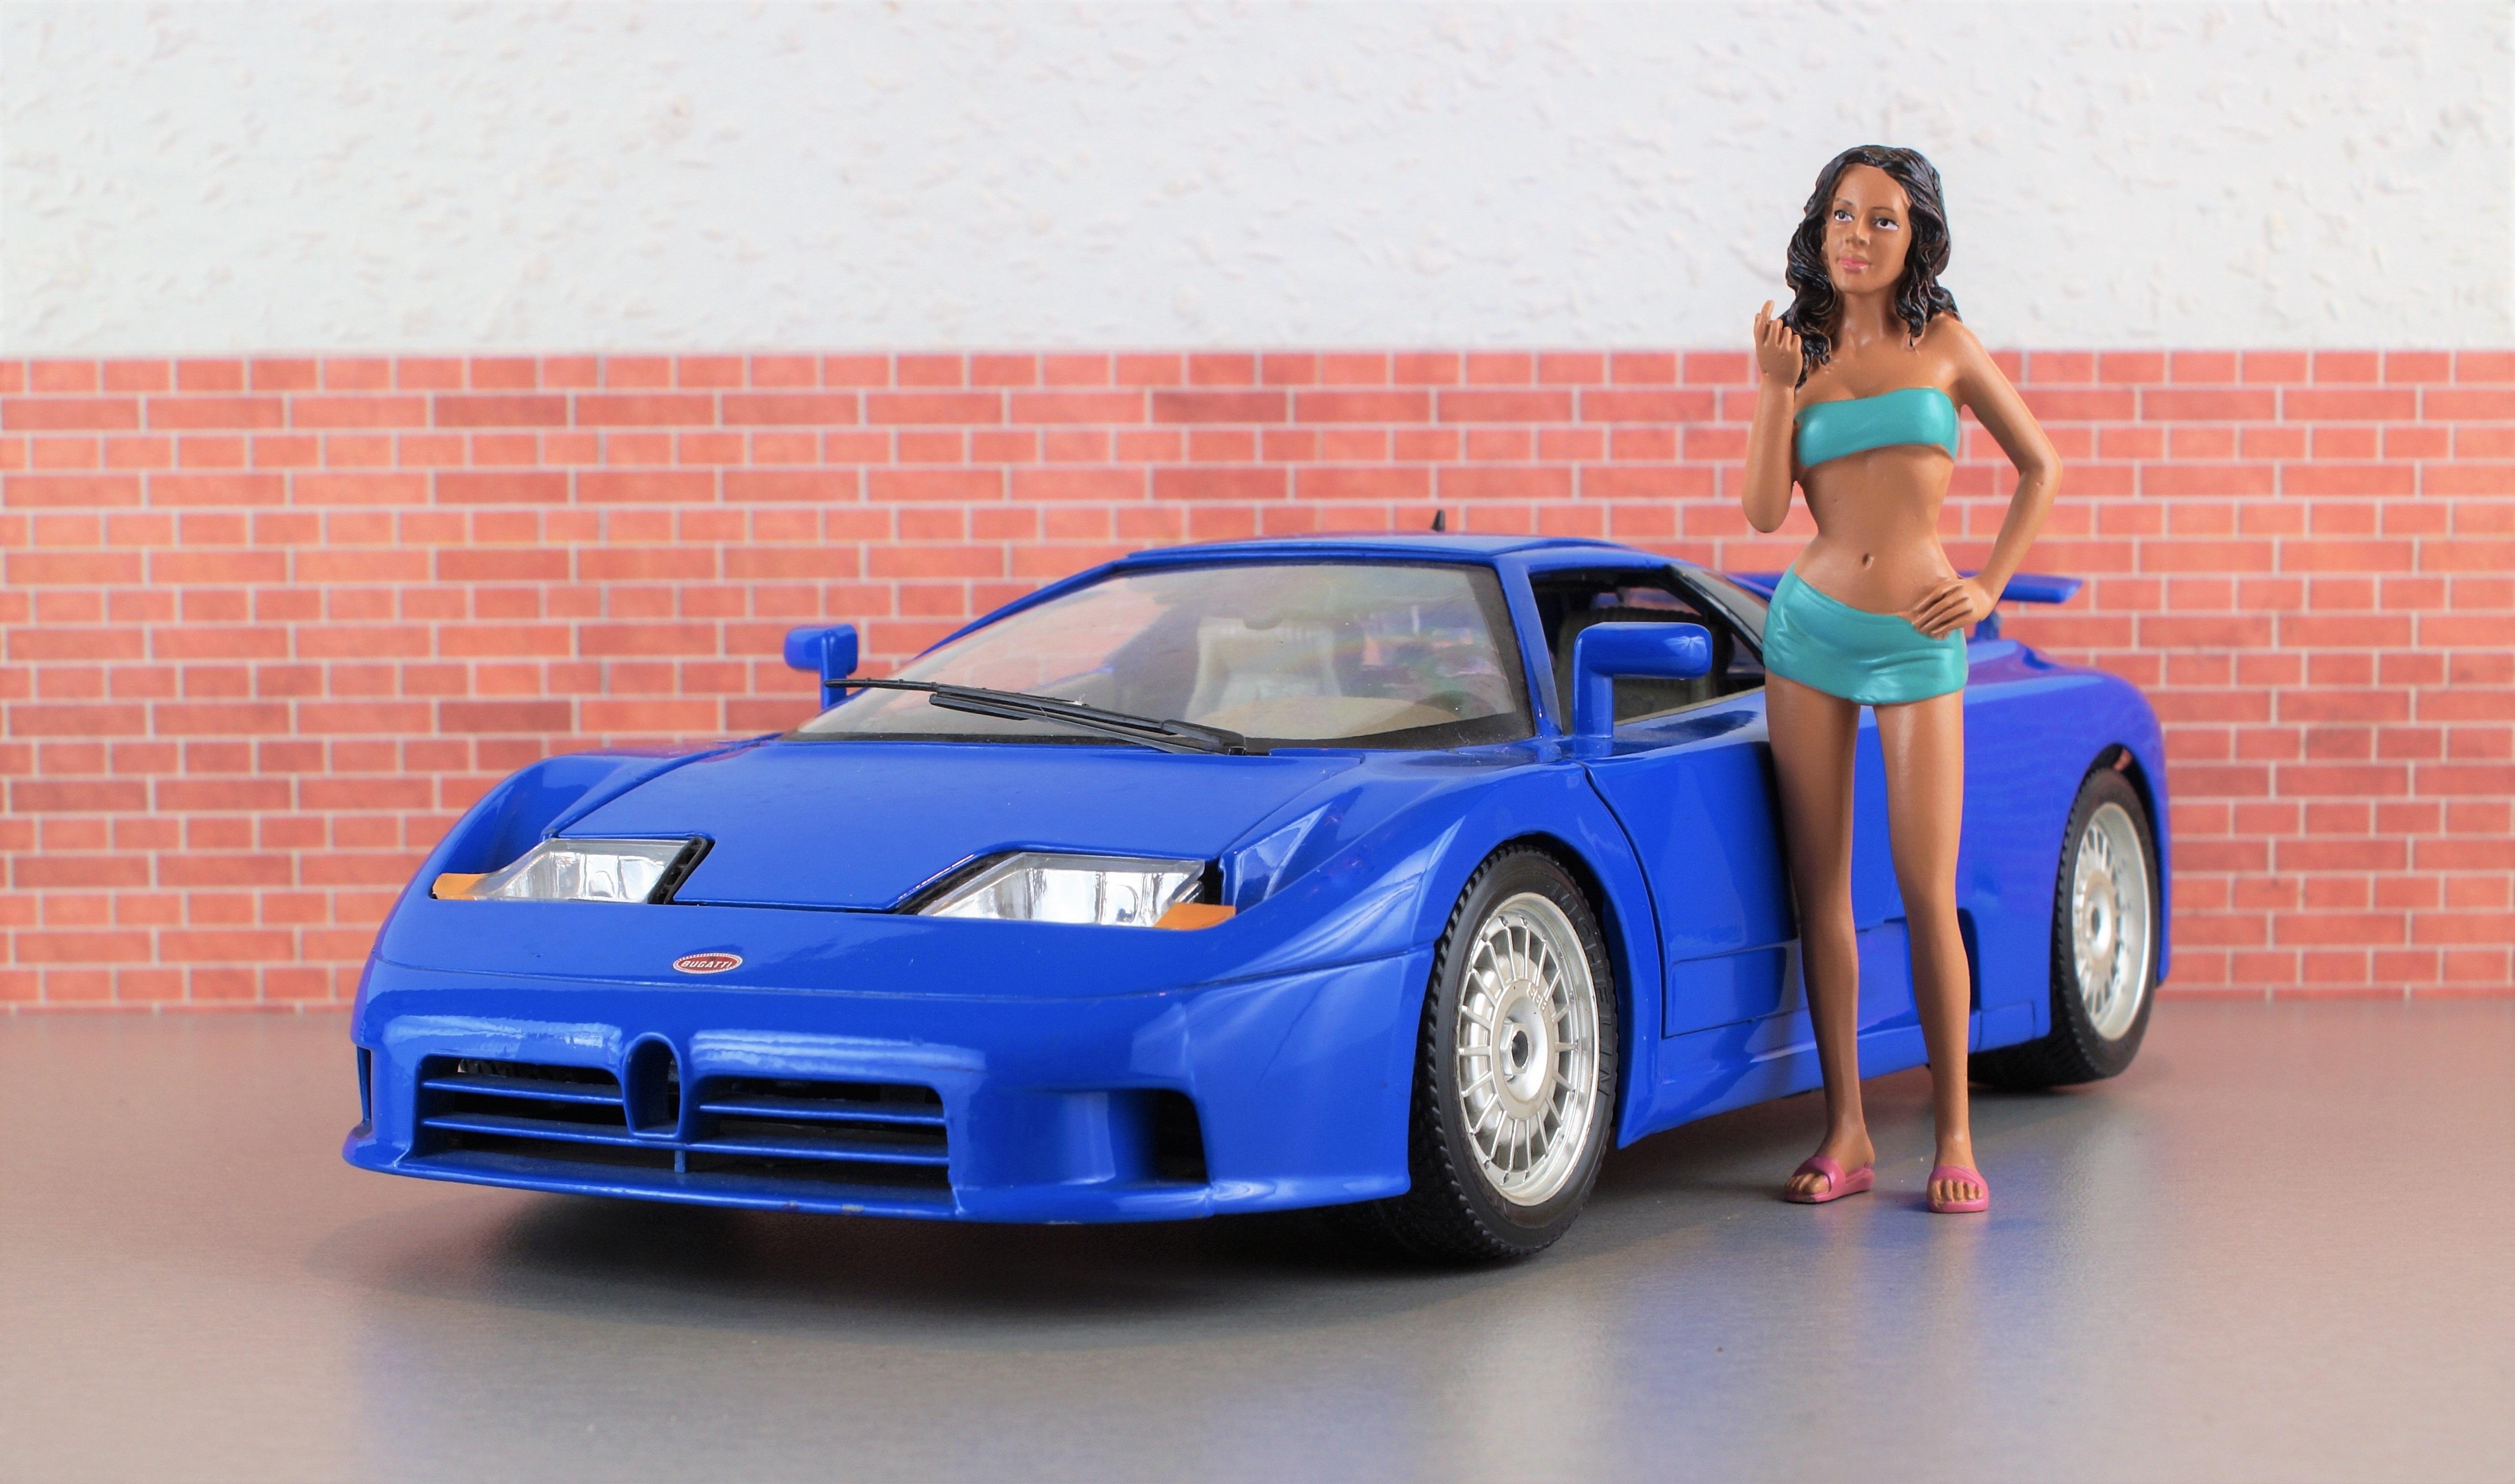 Free Images : model car, bugatti, auto, oldtimer, toys, sports car ...